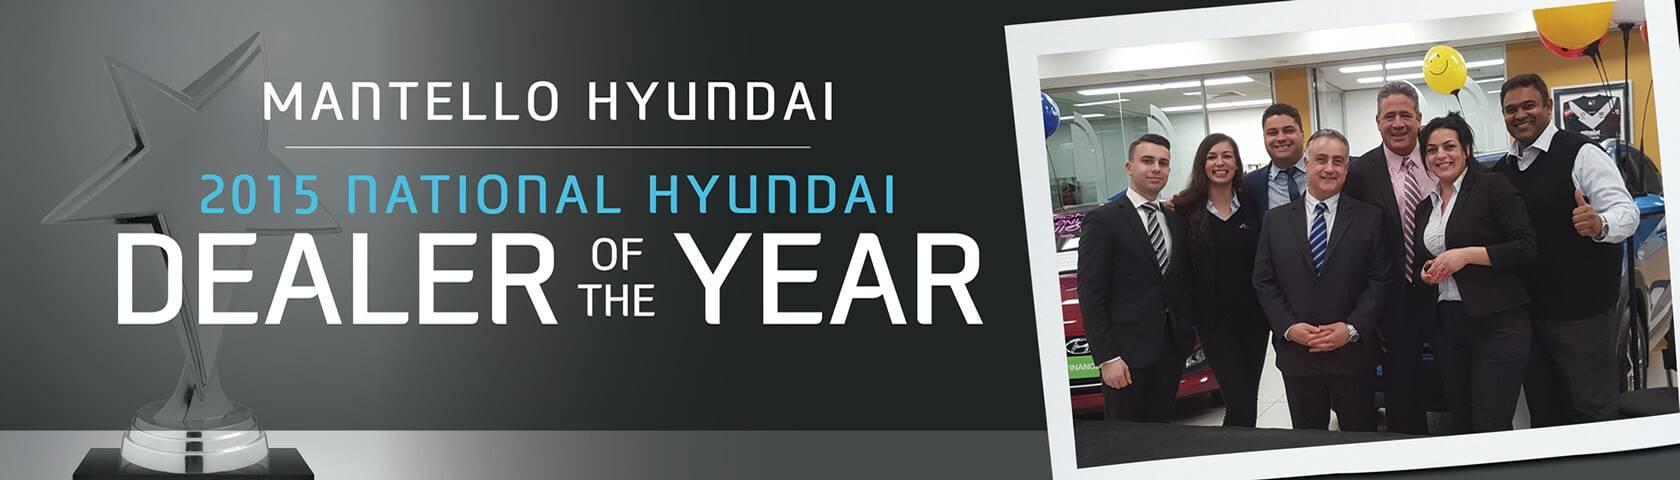 Mantello Hyundai Dealer of the Year